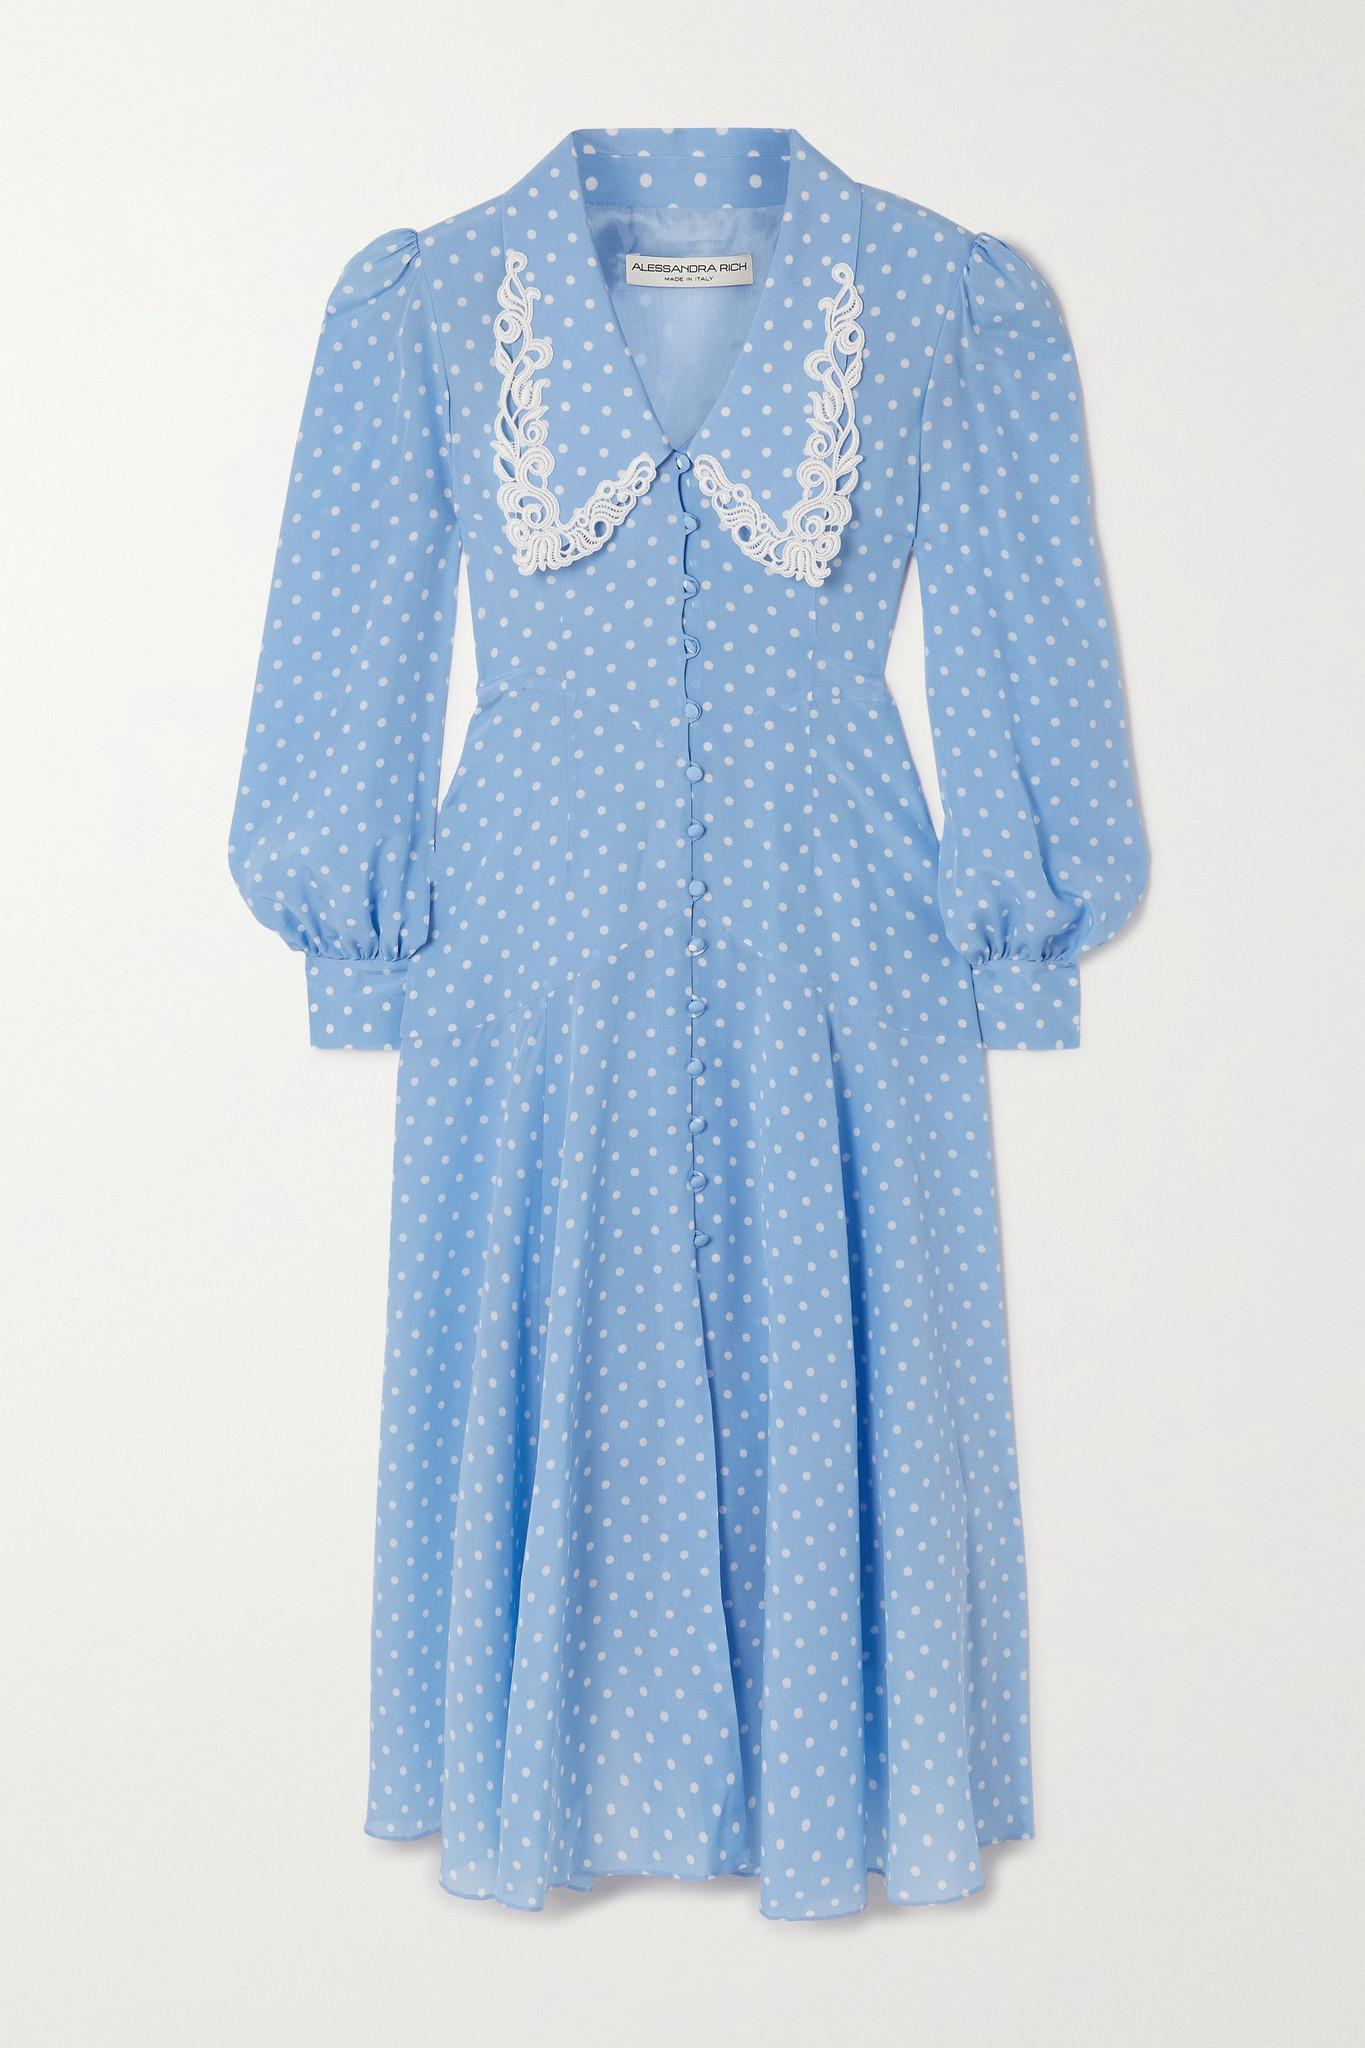 ALESSANDRA RICH - Macramé-trimmed Polka-dot Silk Crepe De Chine Midi Dress - Blue - IT38